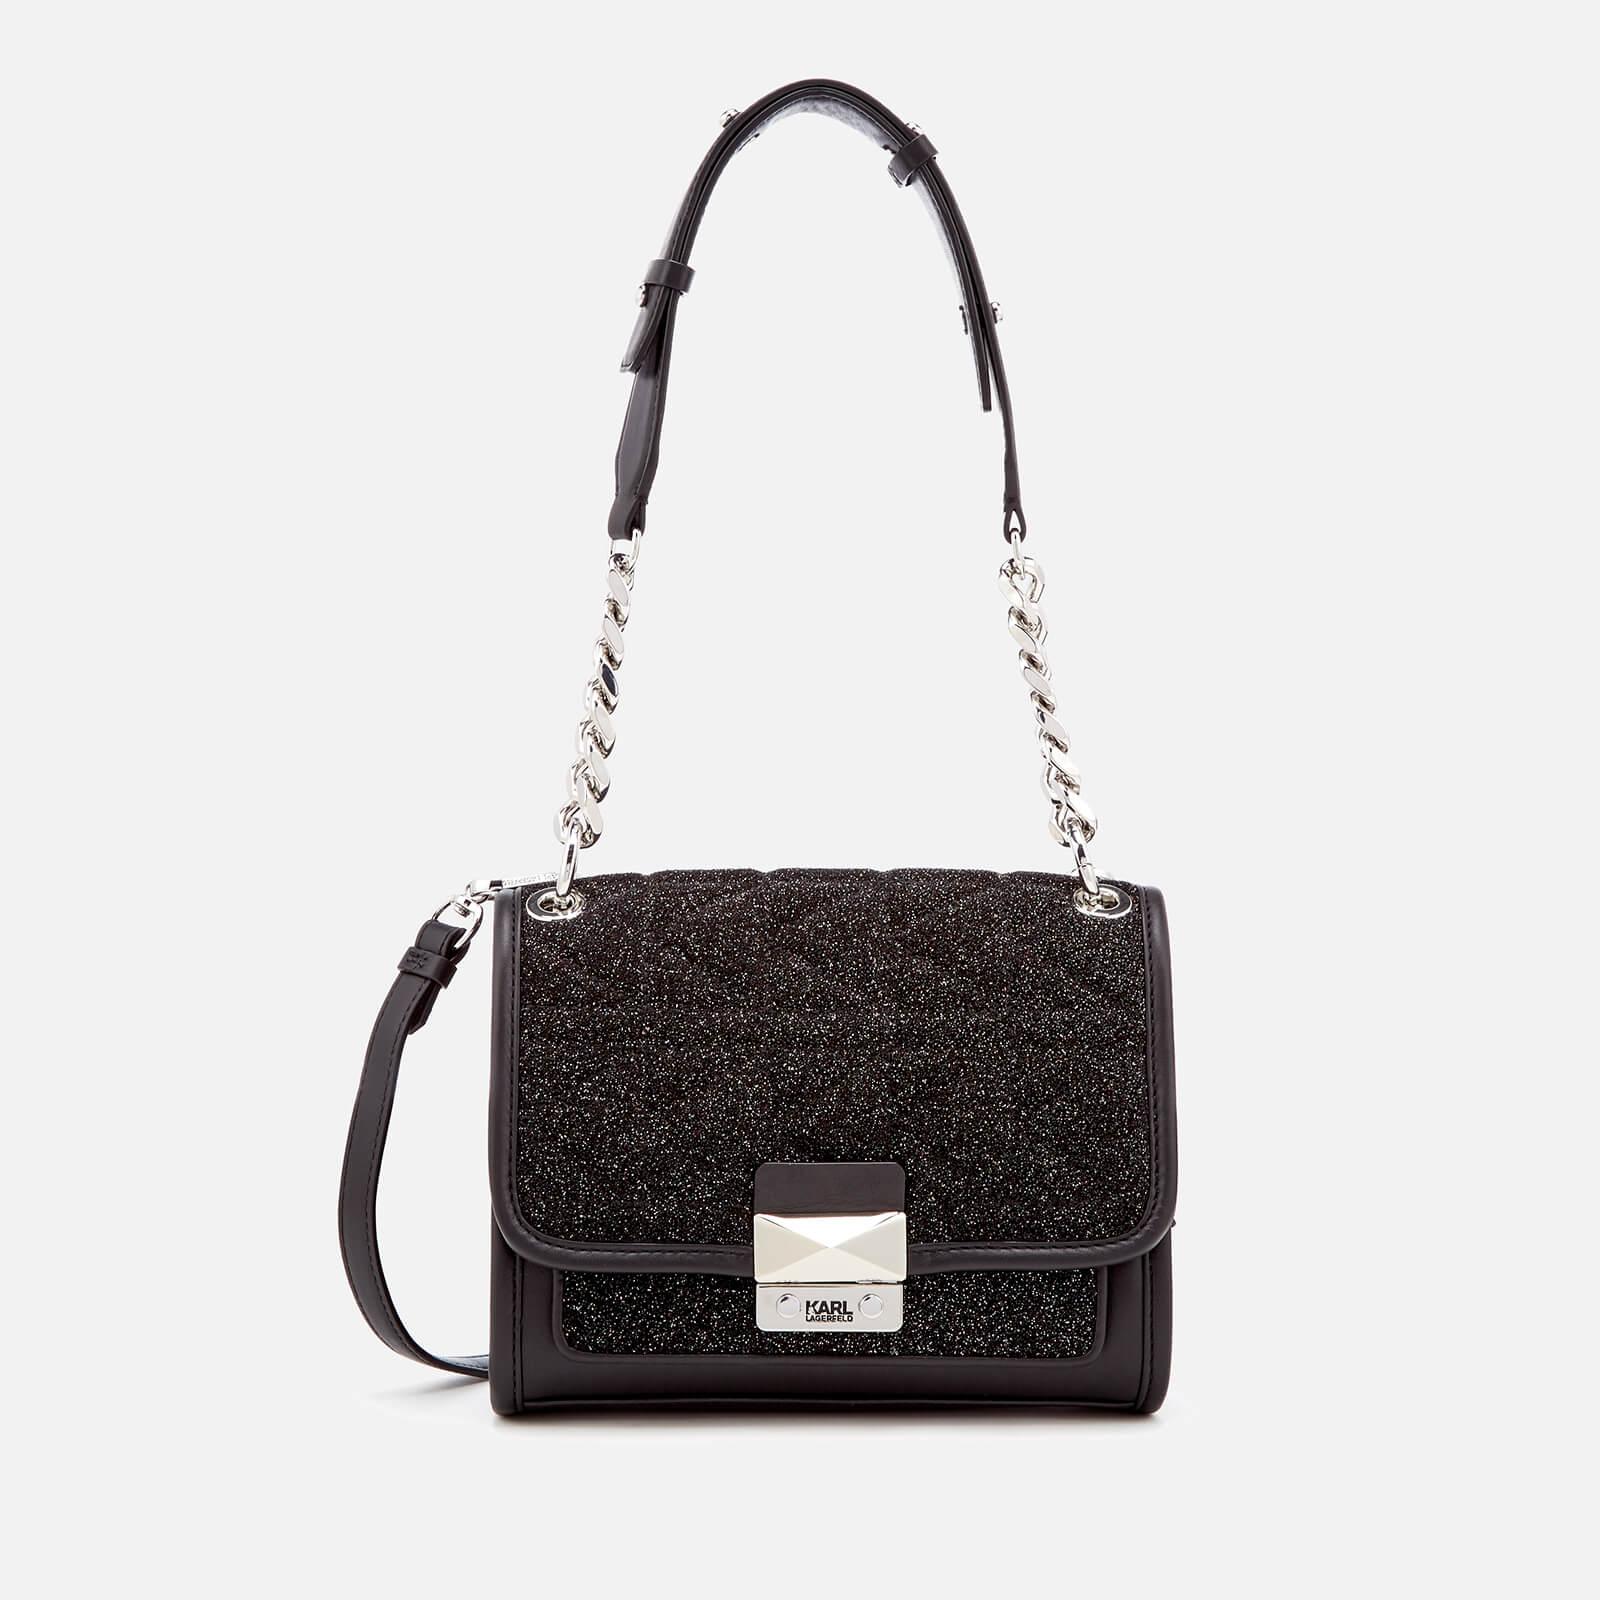 1eb615aebf81 Karl Lagerfeld Women s K Kuilted Caviar Mini Handbag - Multi - Free ...